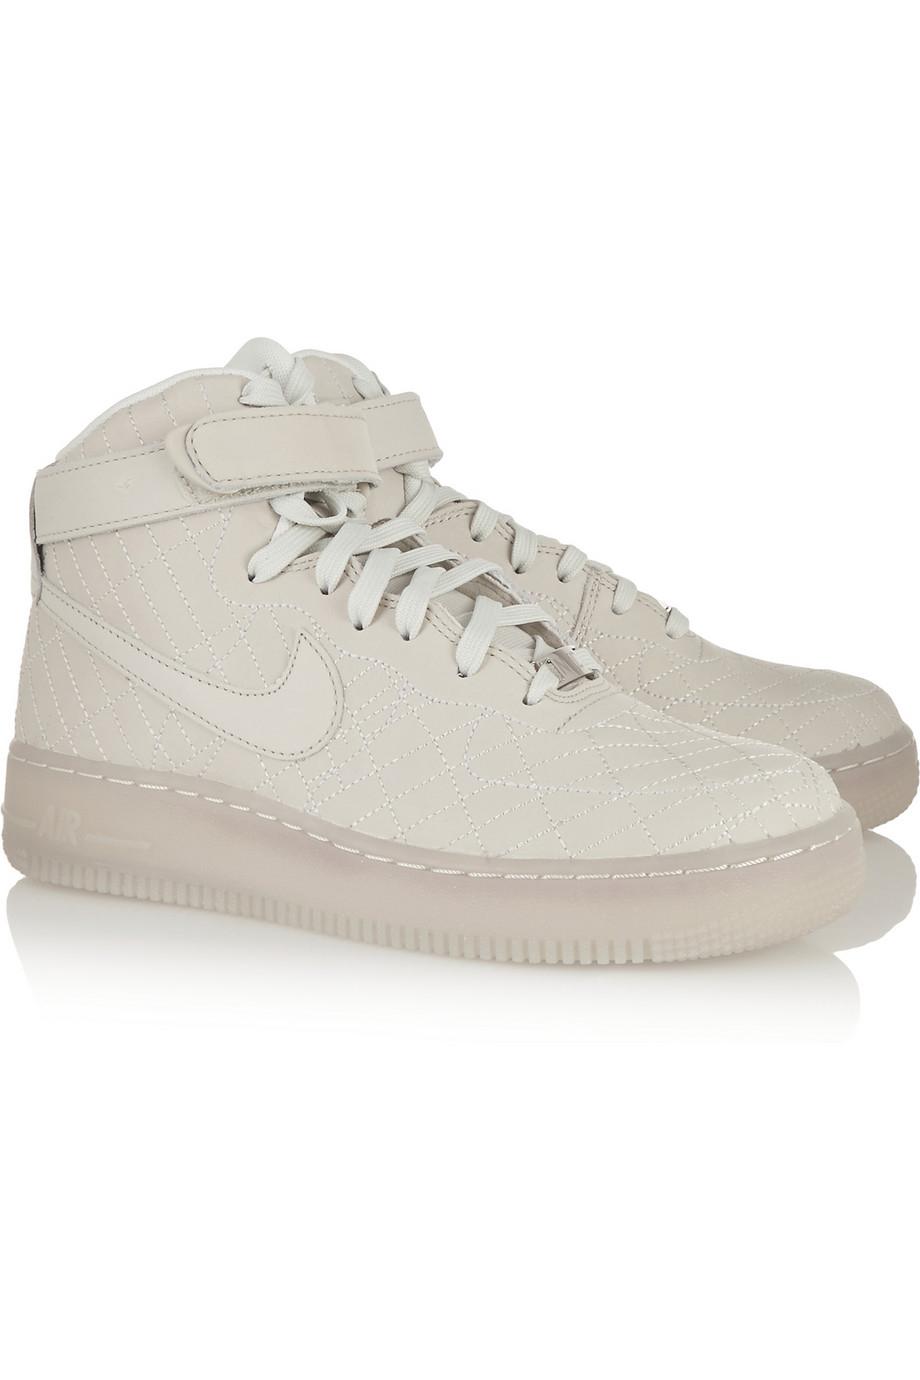 Nike Air Force 1 Nyc Cuir Haut-dessus